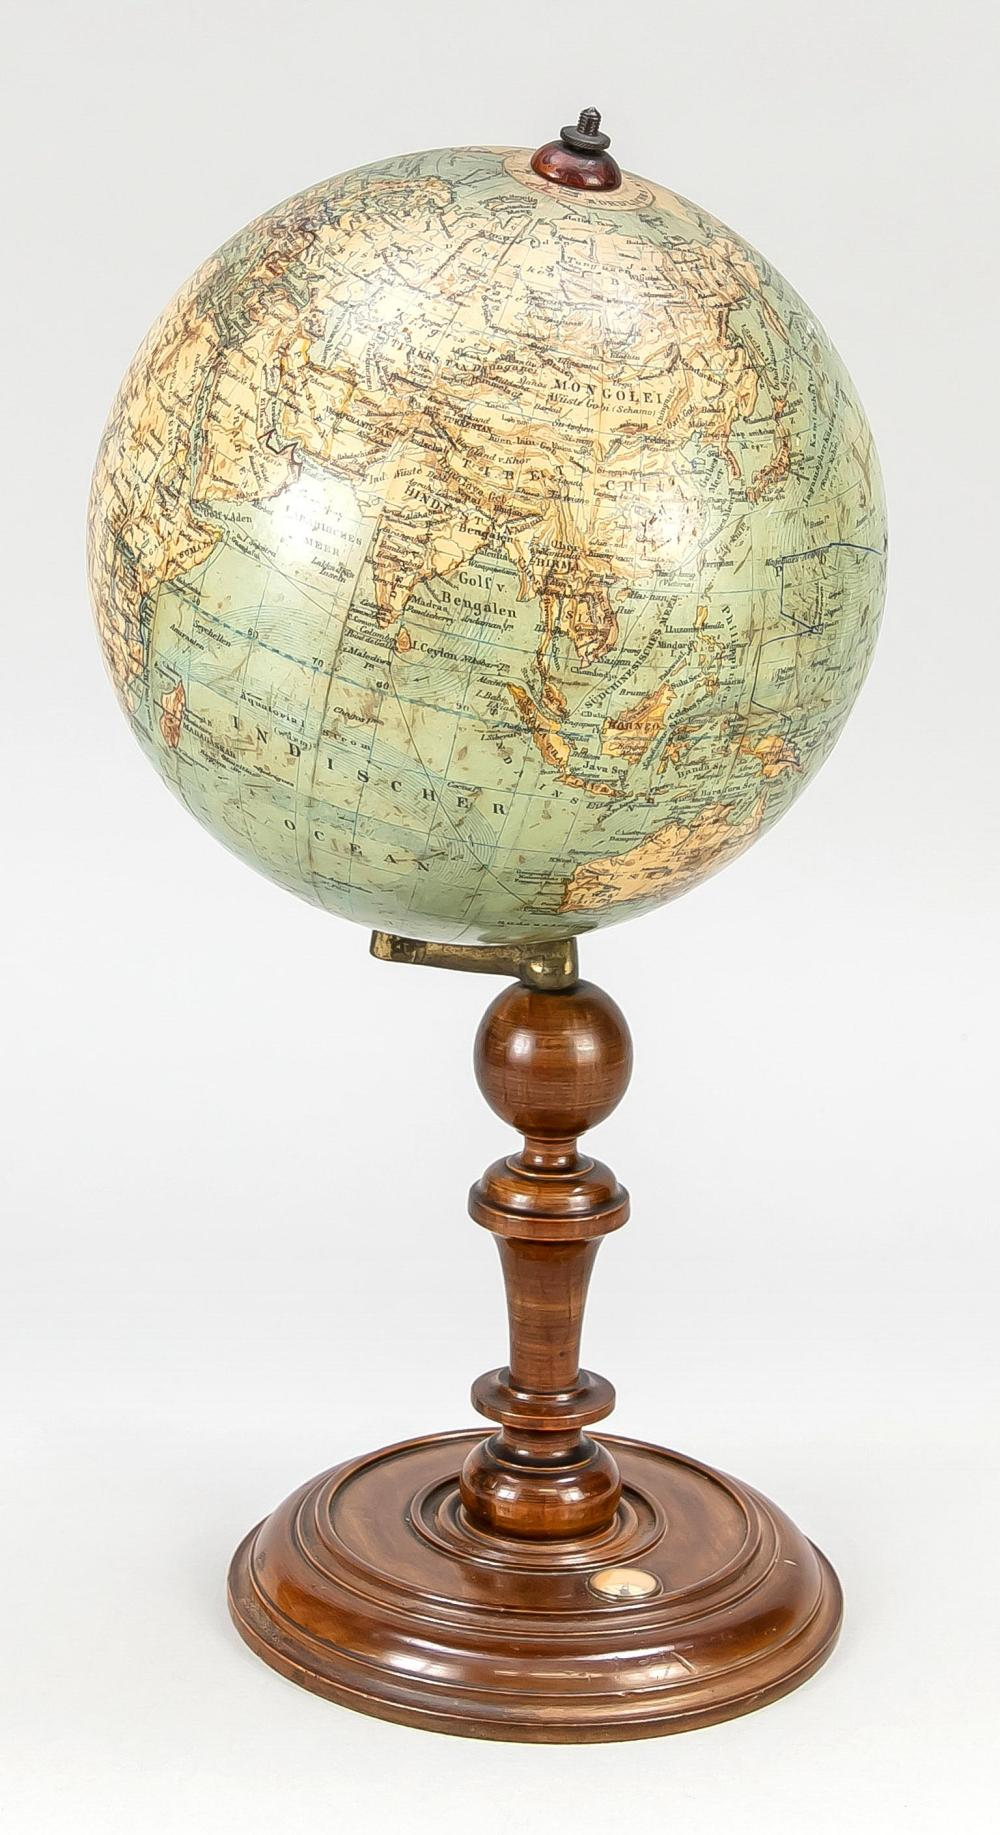 Heymann, L.J. Earth globe, wooden